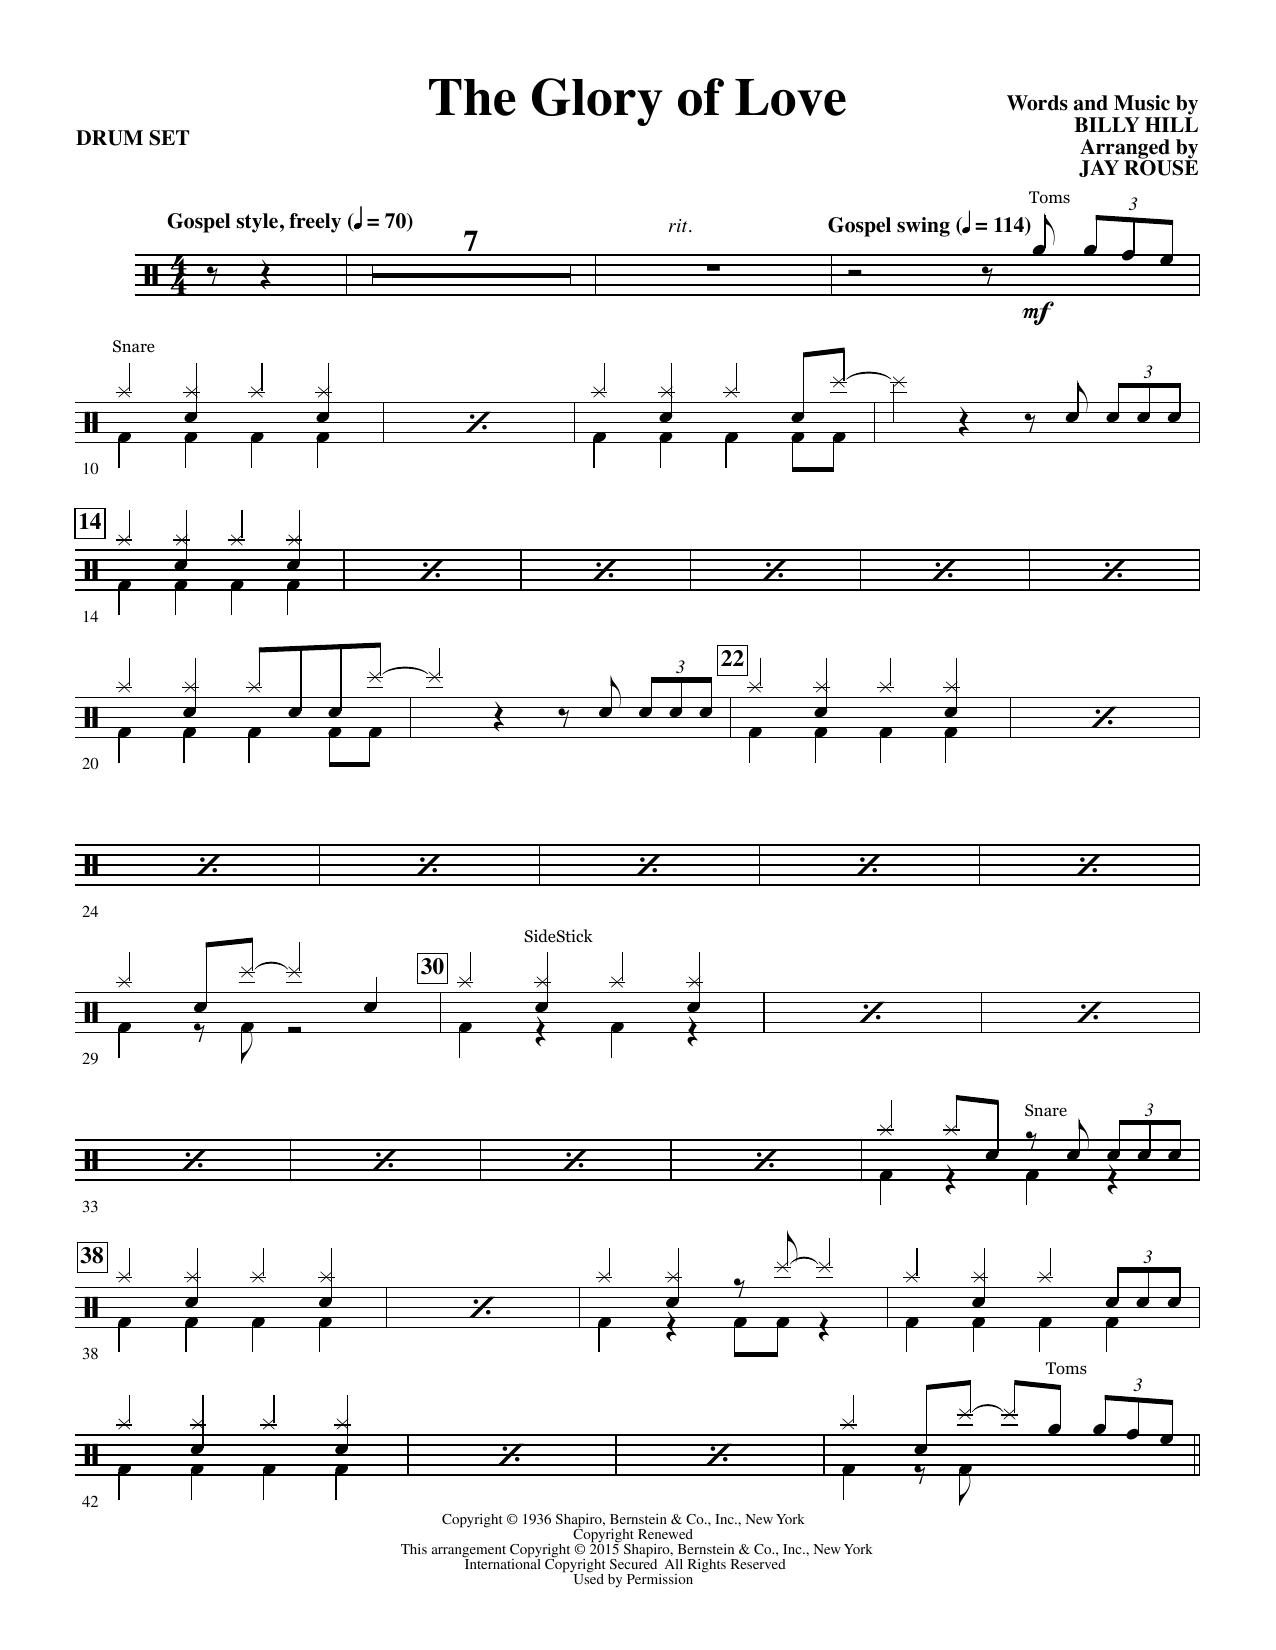 The Glory of Love - Drum Set Sheet Music